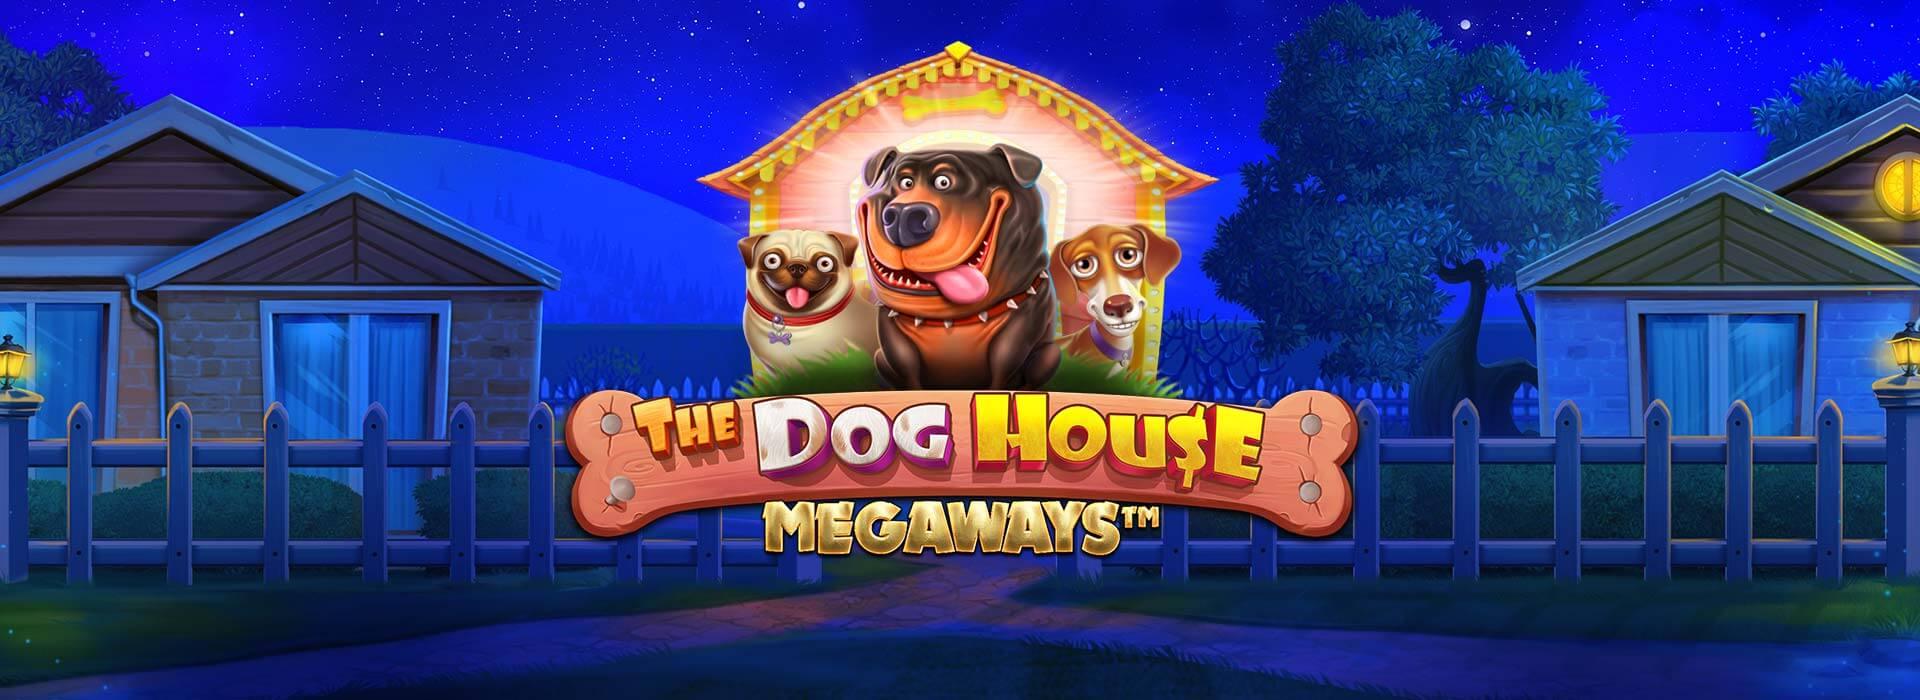 Dog House Megaways Slot Logo Slots Racer